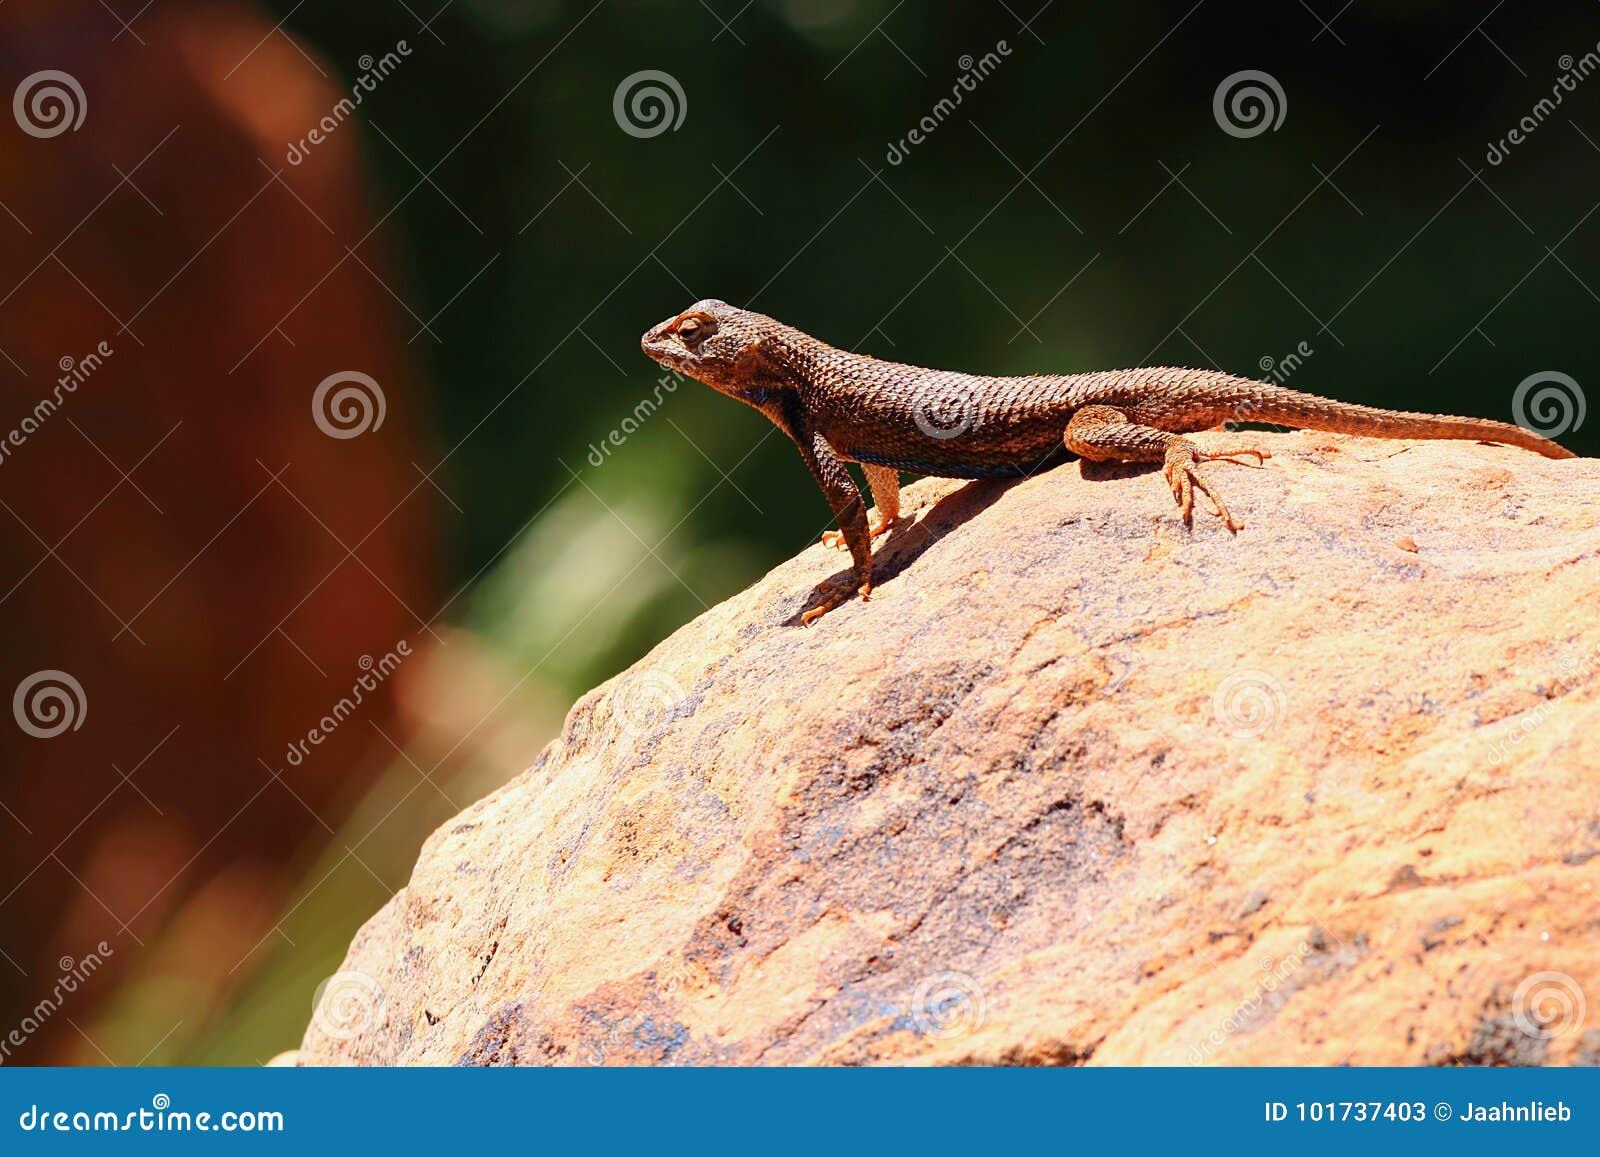 Common Sagebrush Lizard - Sceloporus graciosus - on Rock, Zion National Park, Utah